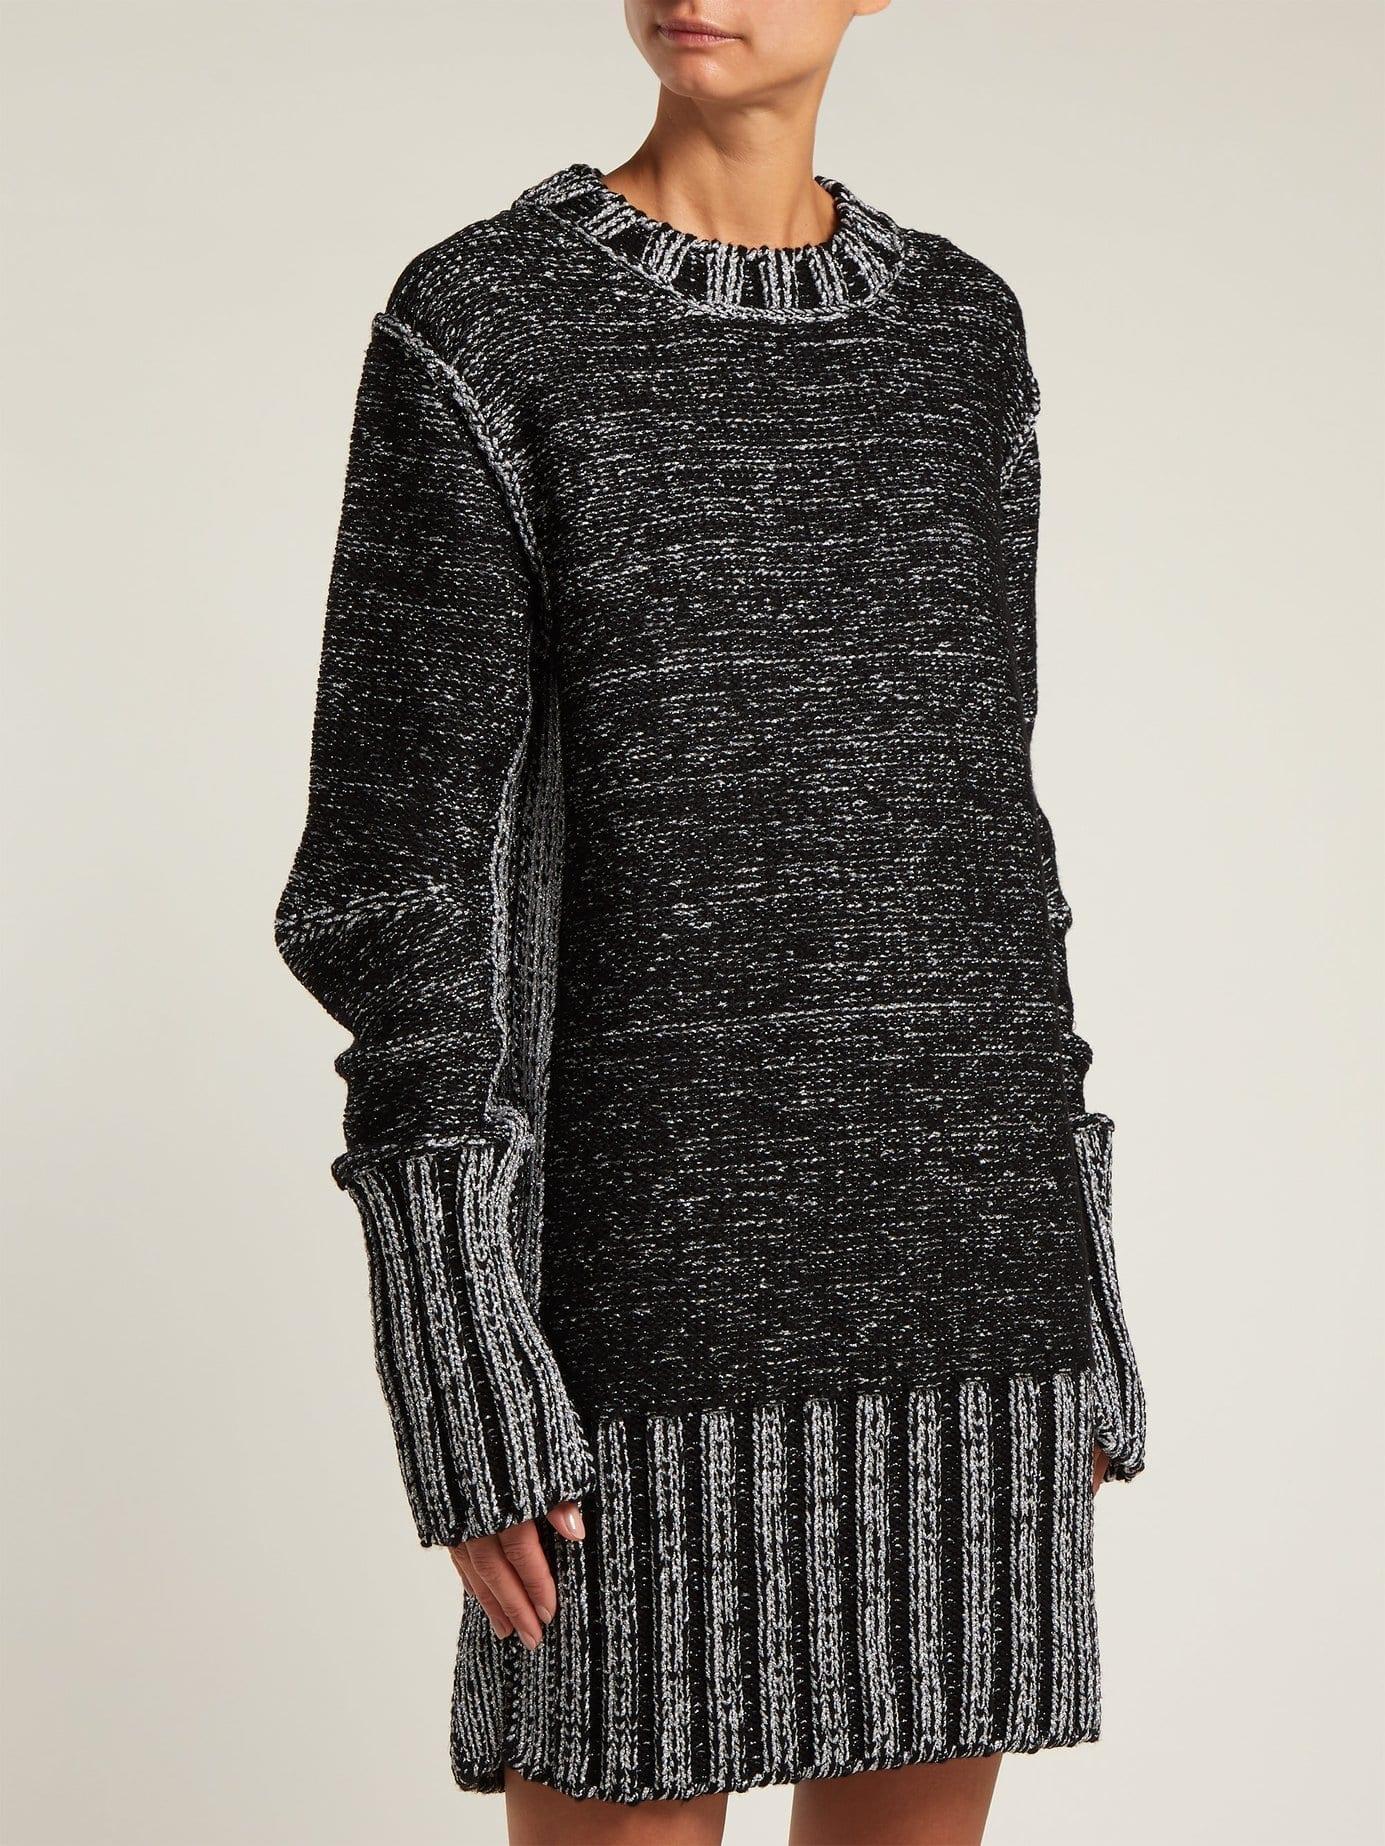 MM6 MAISON MARGIELA Metallic Heavy Knit Sweater Black Dress. MM6 MAISON  MARGIELA Metallic Heavy Knit Sweater Black Dress c8a3fe086